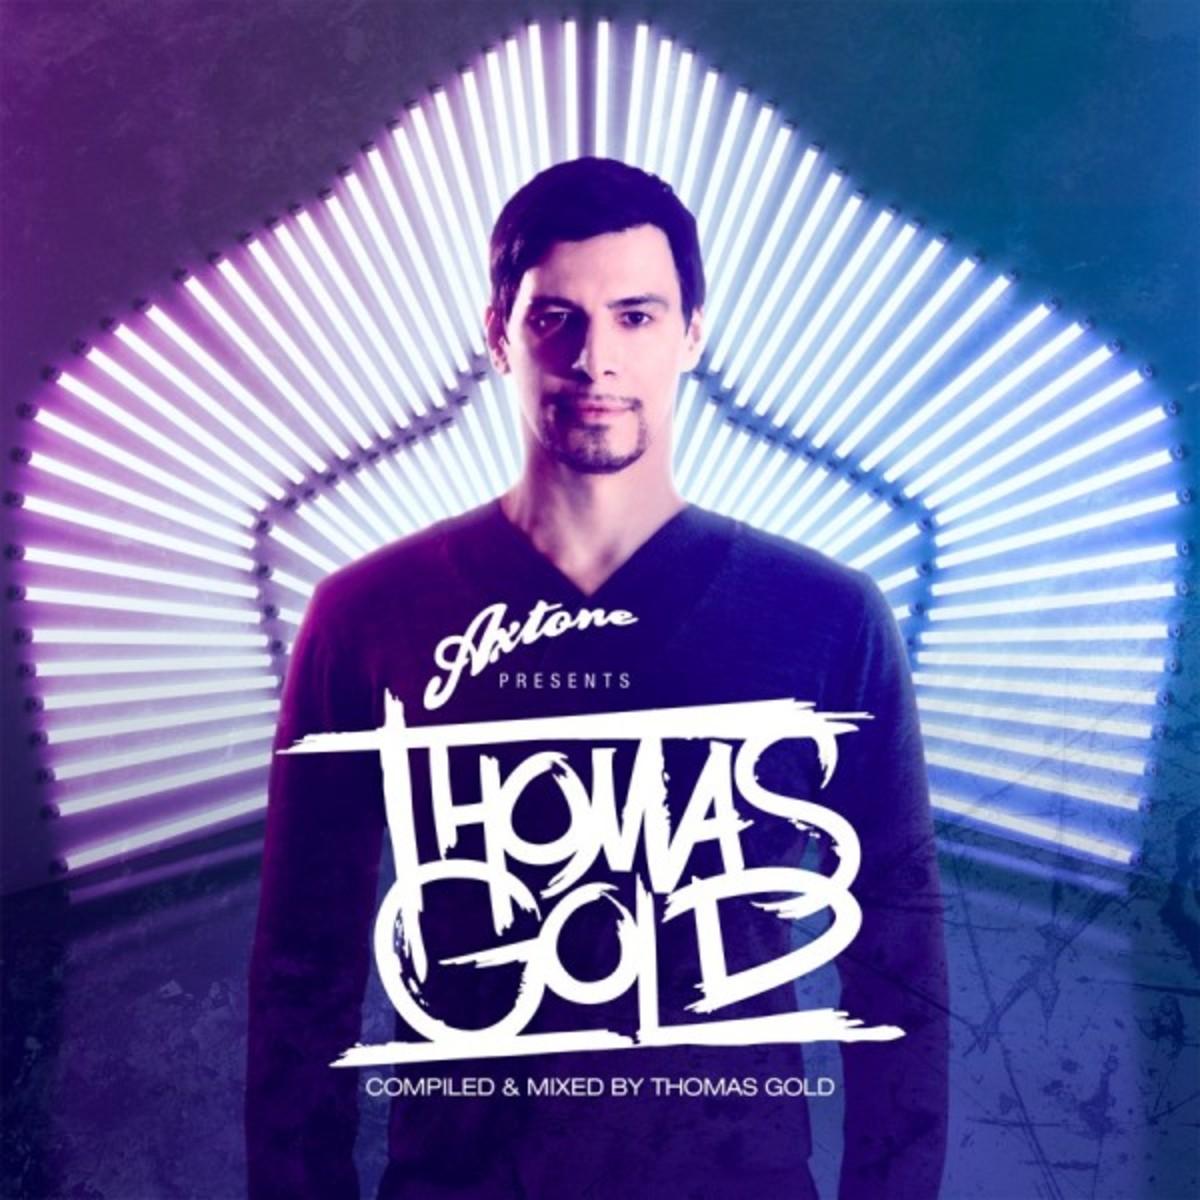 Axtone-Presents-Thomas-Gold-600x6001